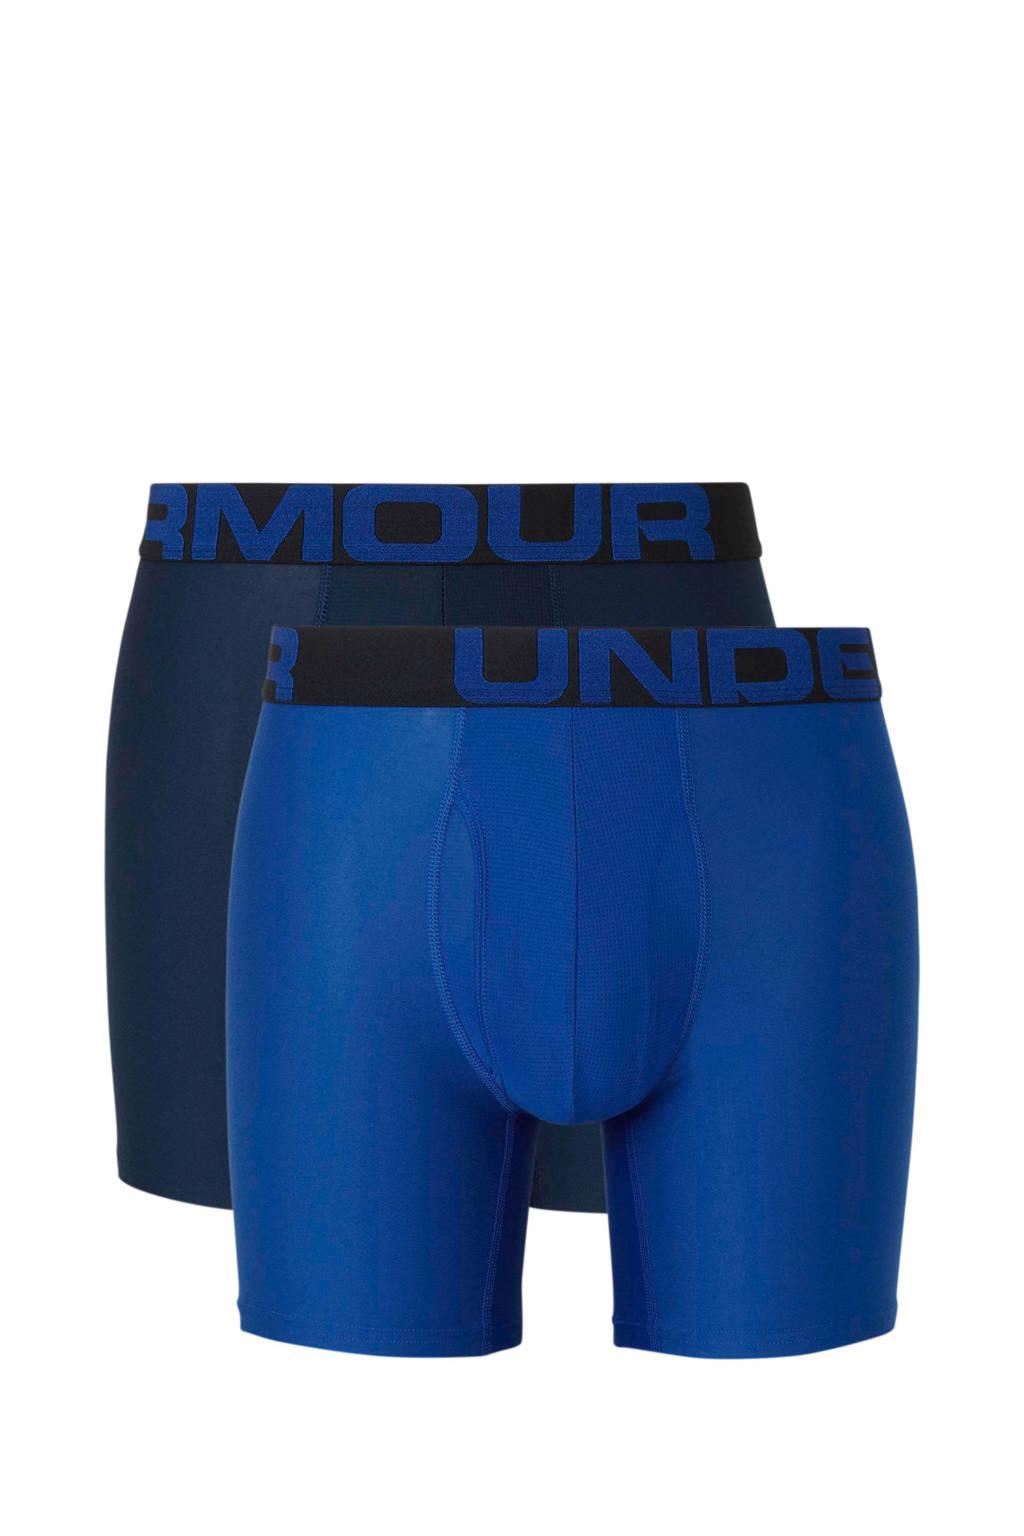 Under Armour sportboxer (set van 2) blauw, Blauw